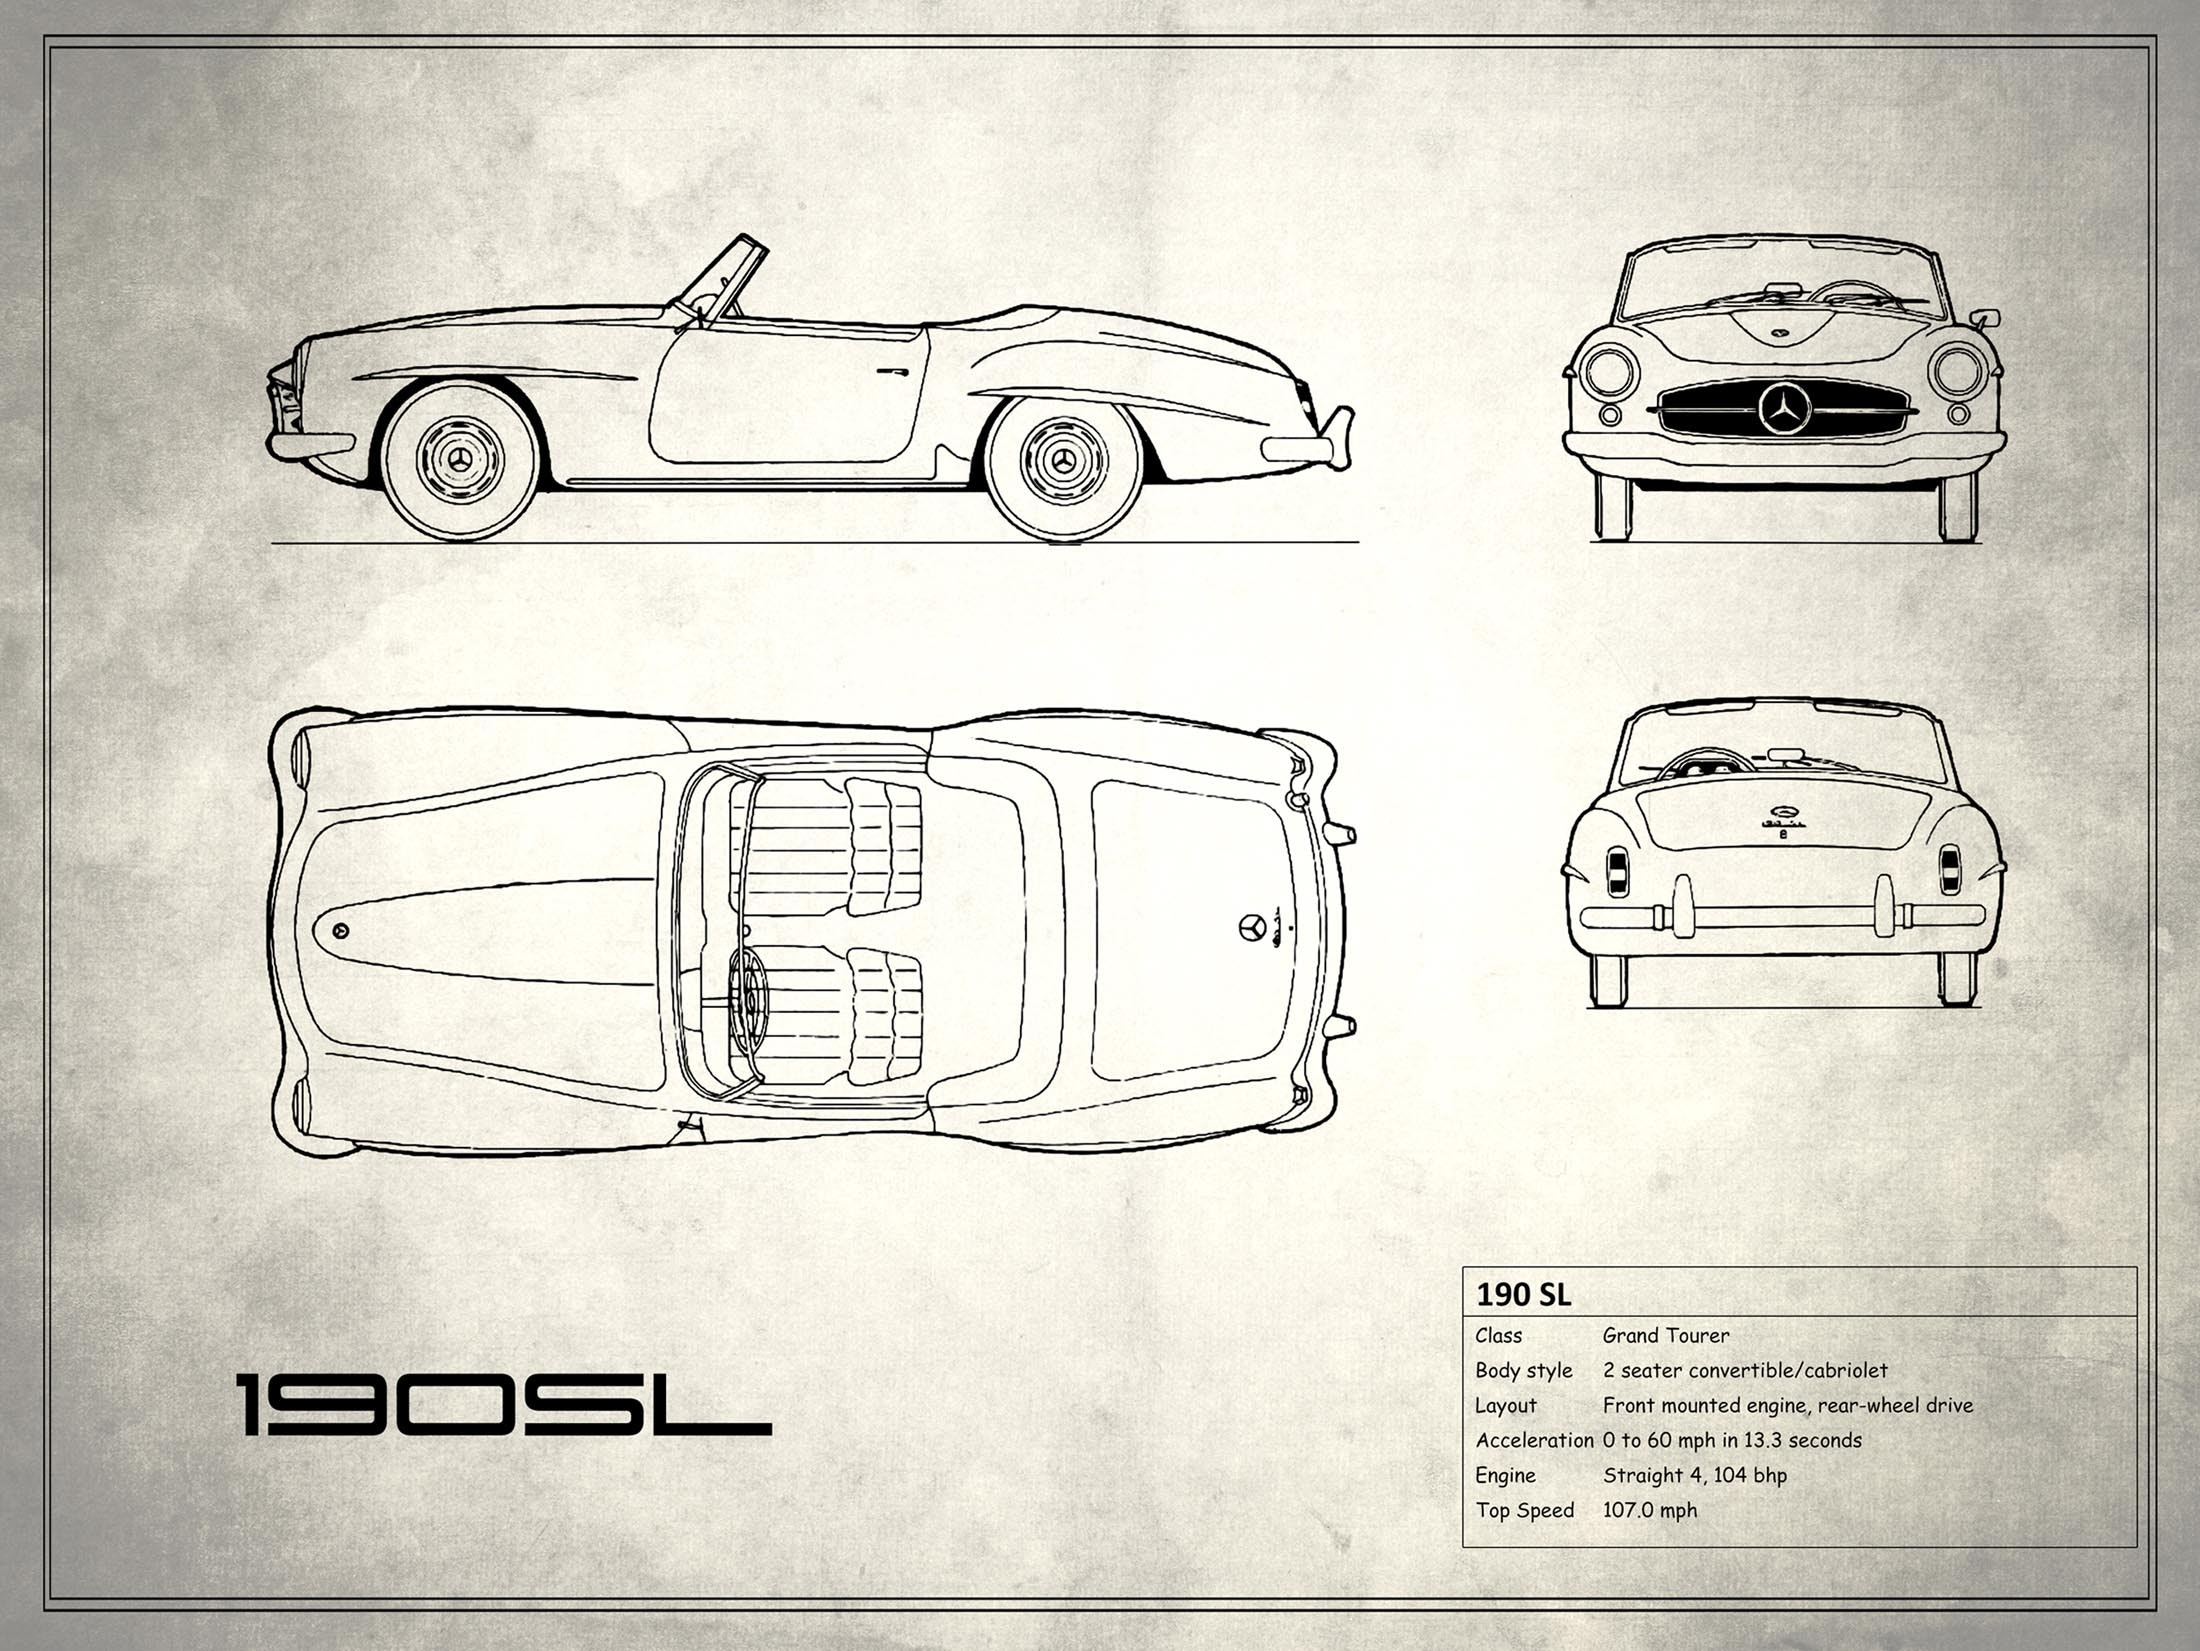 Mercedes-Benz 190 SL - White